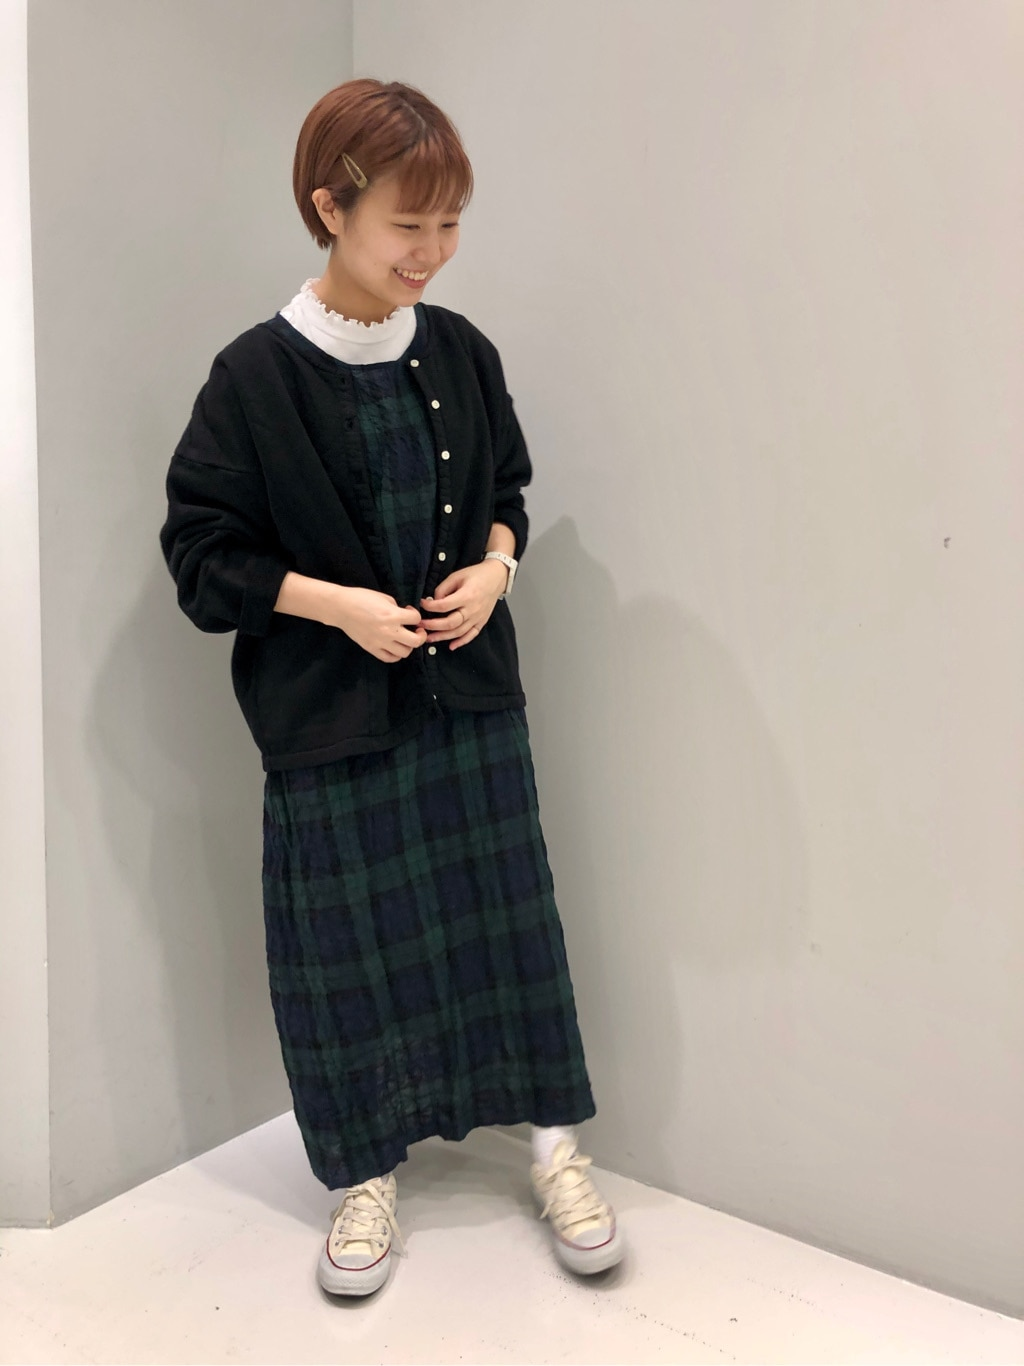 bulle de savon なんばシティ 身長:149cm 2020.09.15